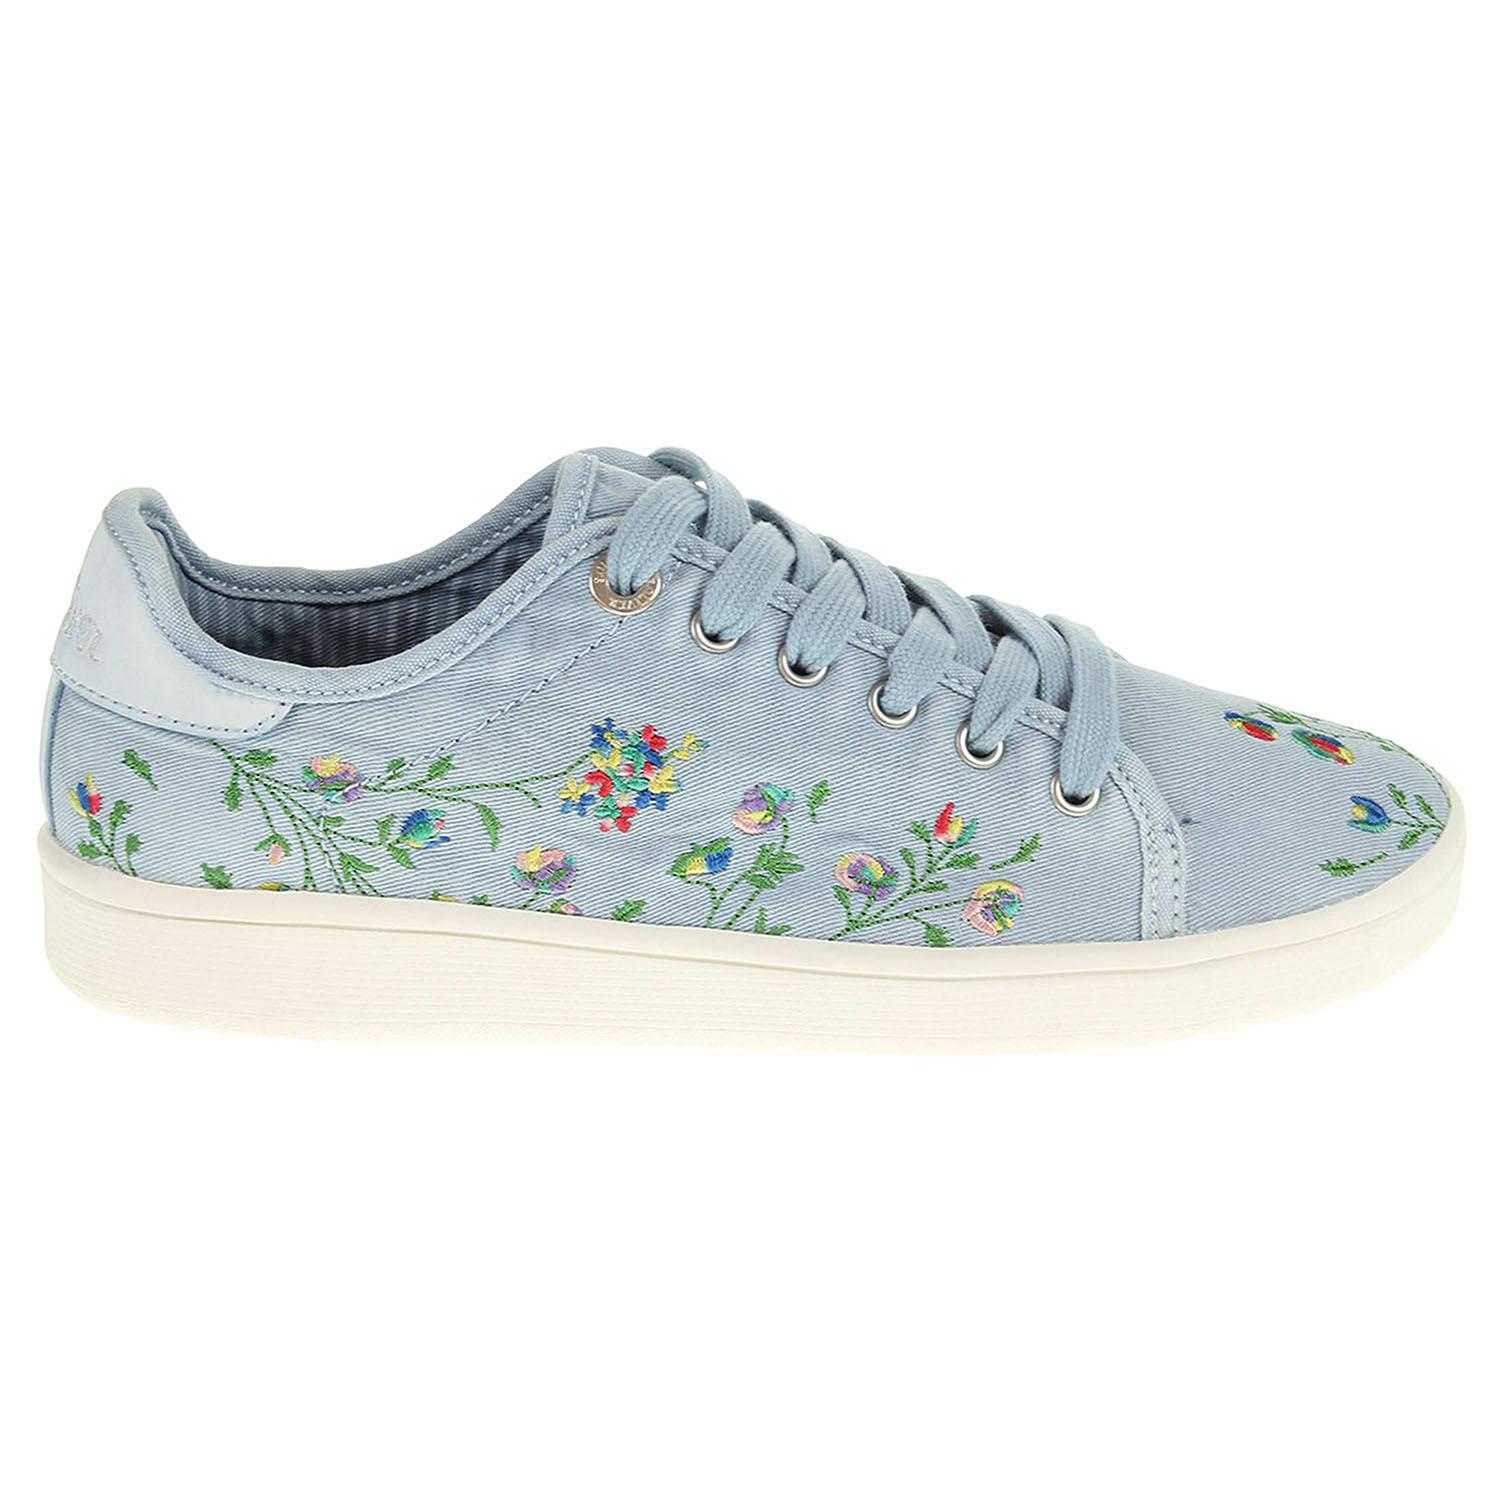 Oliver dámská obuv 5-23647-38 modrá 23200677 ab0ba6d2754